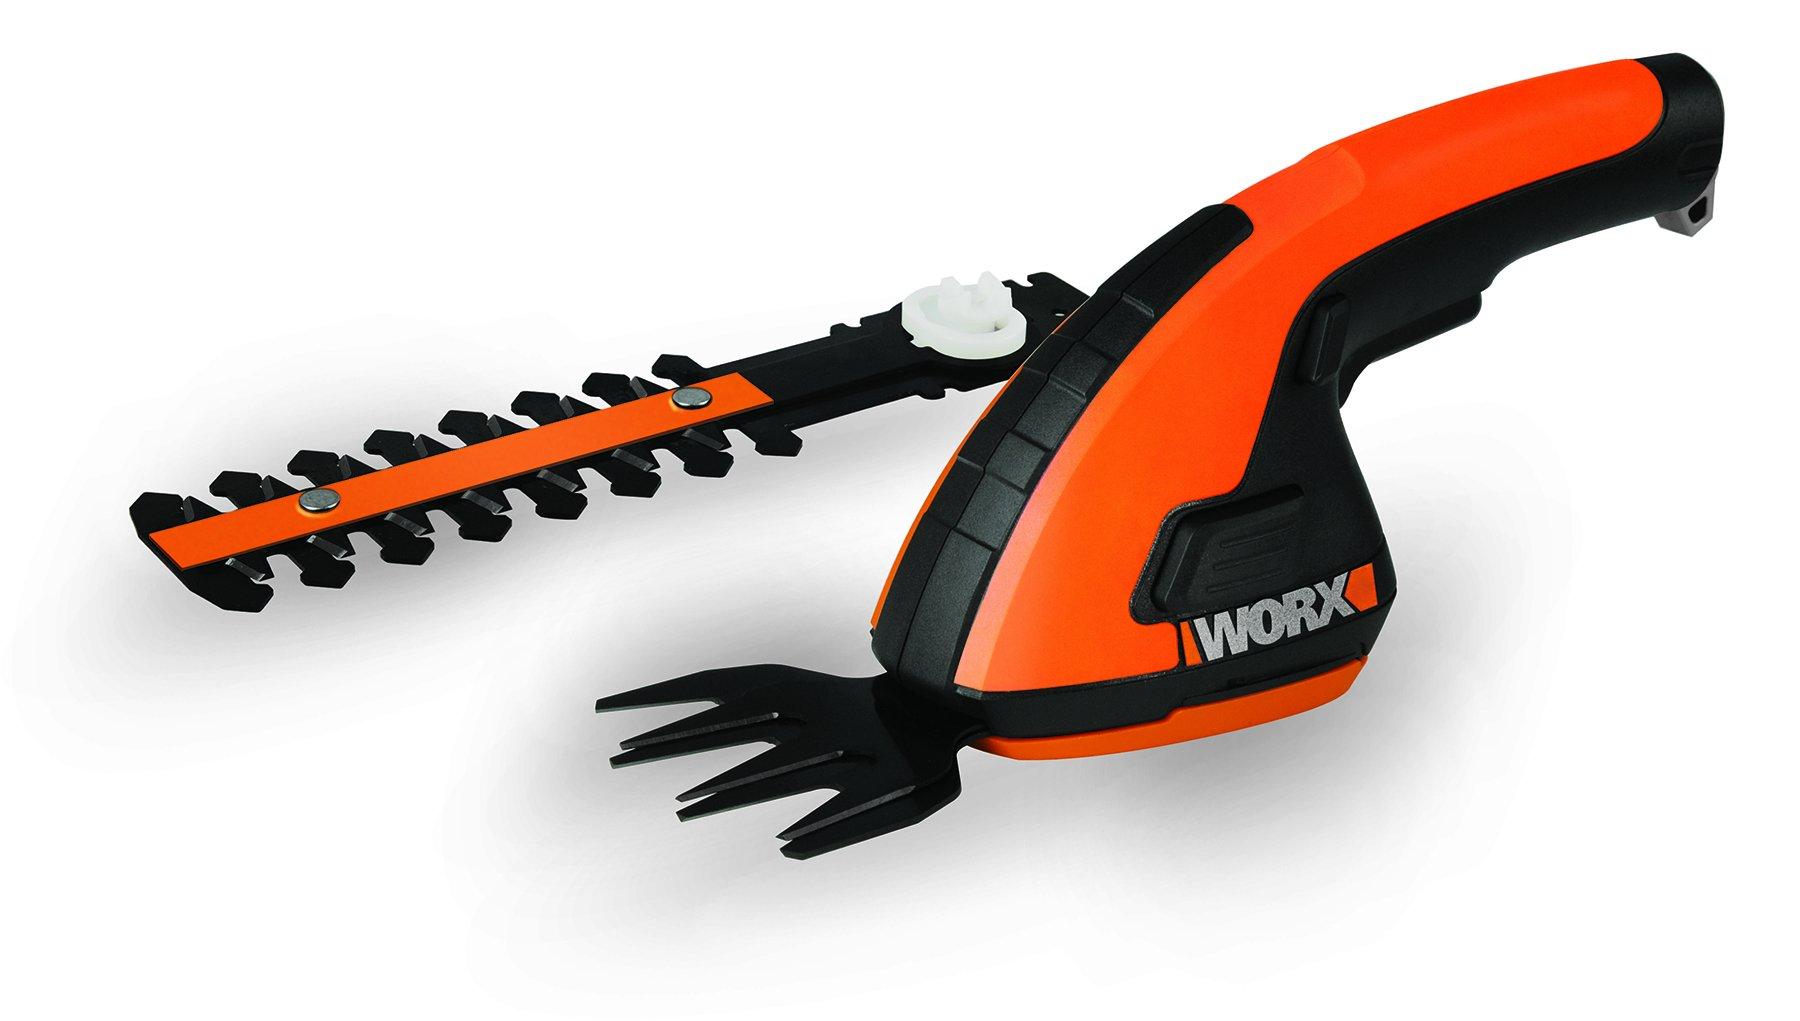 WORX WG800.1 3.6-Volt Lithium-Ion Cordless Grass Shear/Hedge Trimmer